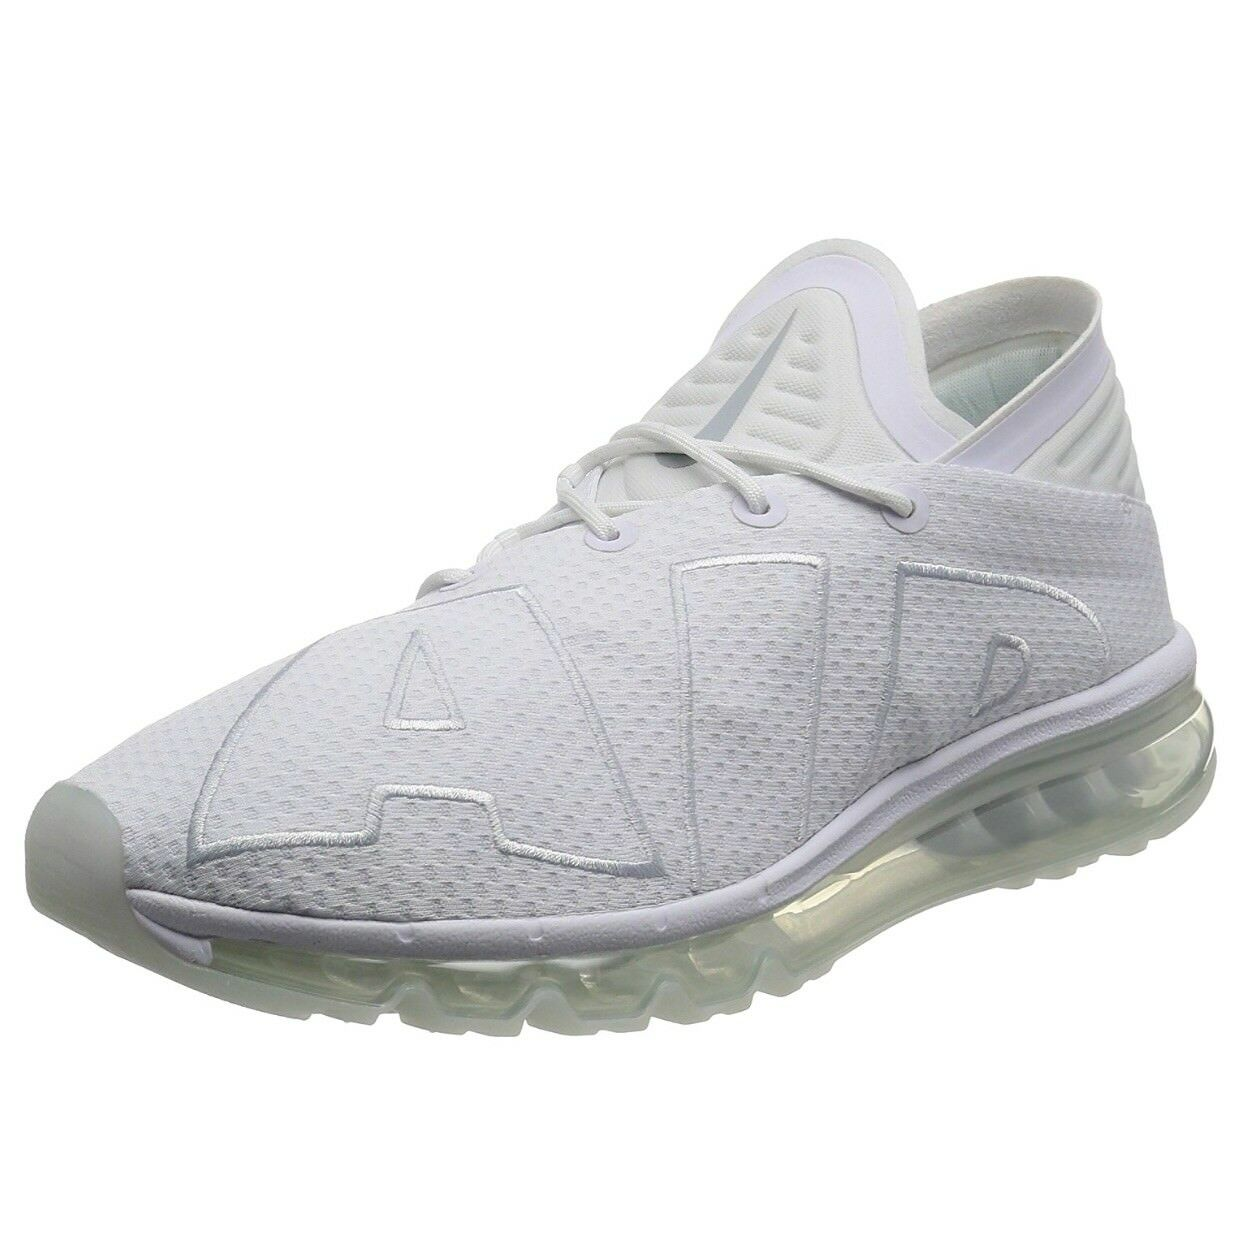 Nike Nike Nike air max flair nuovi uomini scarpe 942236 100-shoes 51e3cb